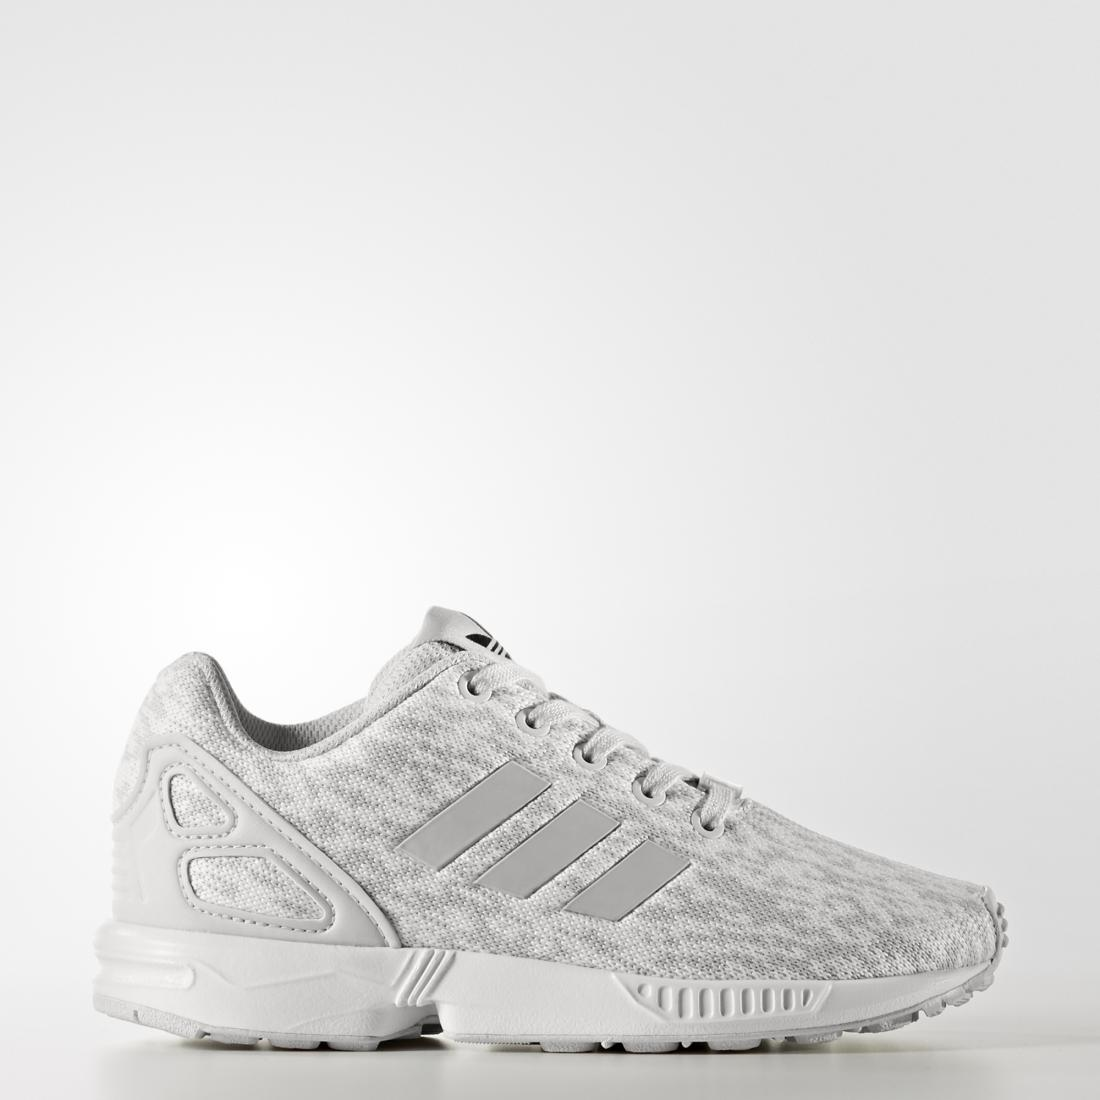 adidas gar?on chaussure